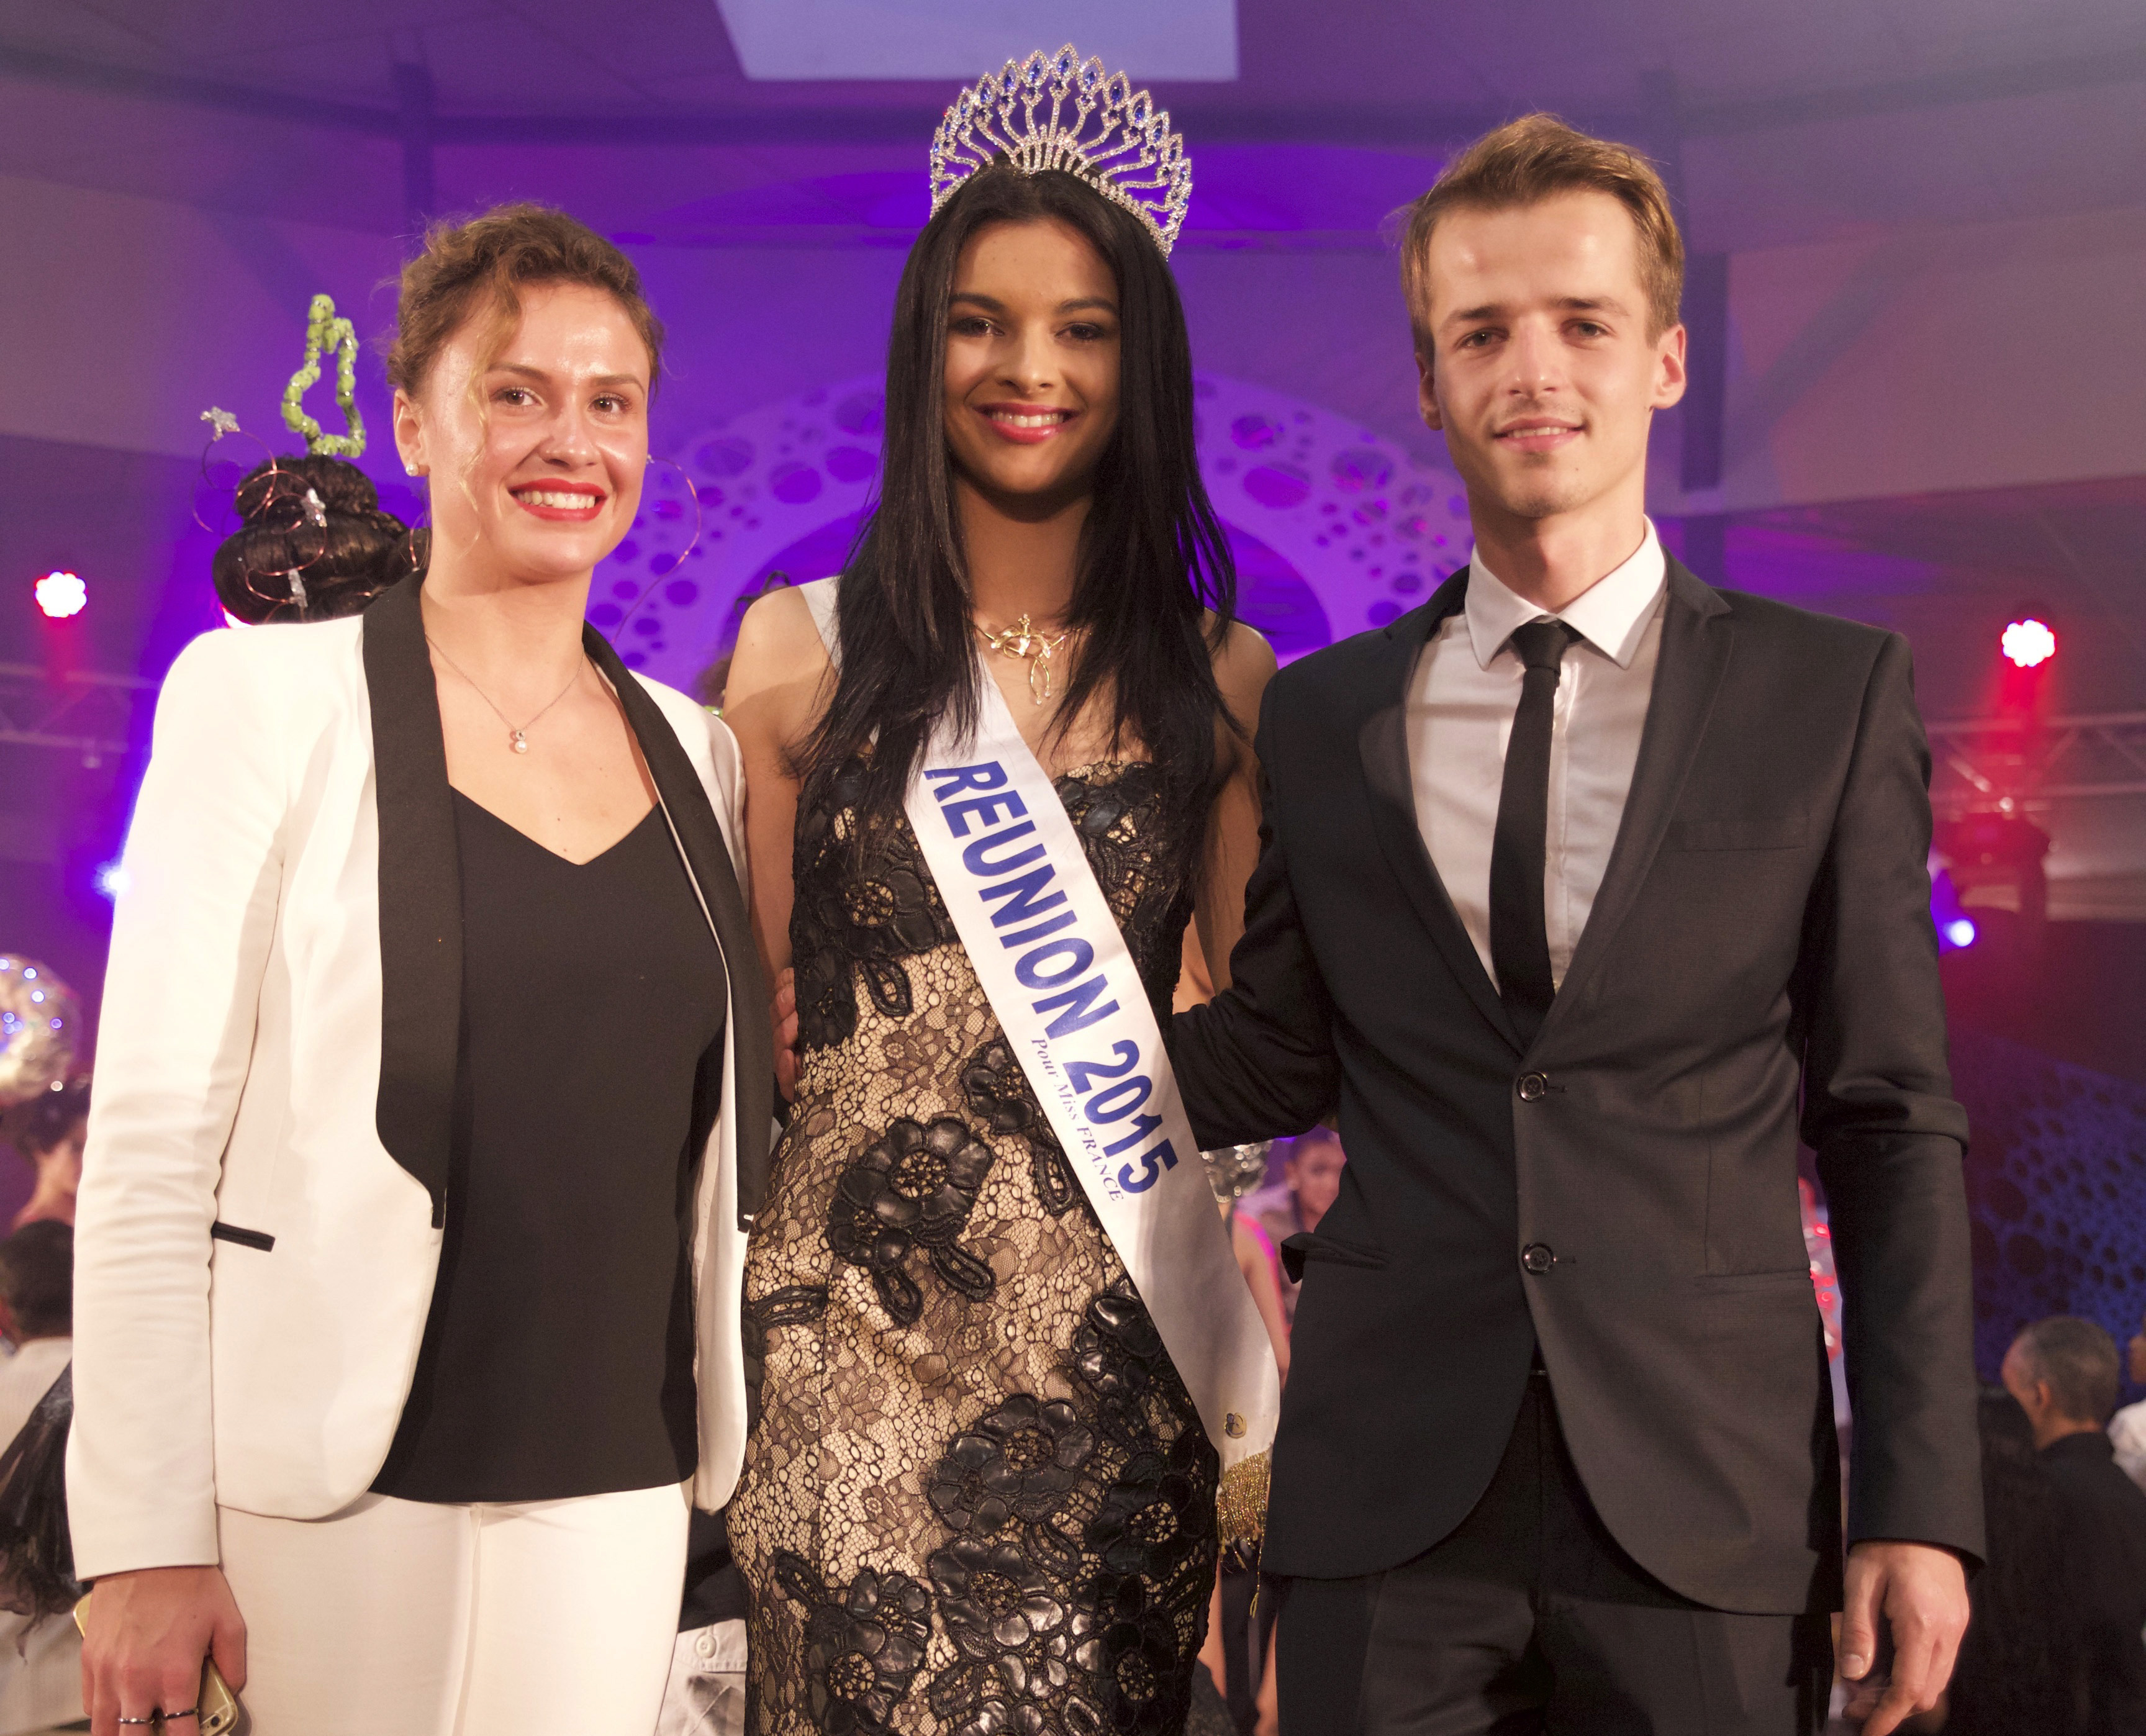 Azuima Issa avec Antoine Koehler, champion du monde de coiffure, et sa collaboratrice